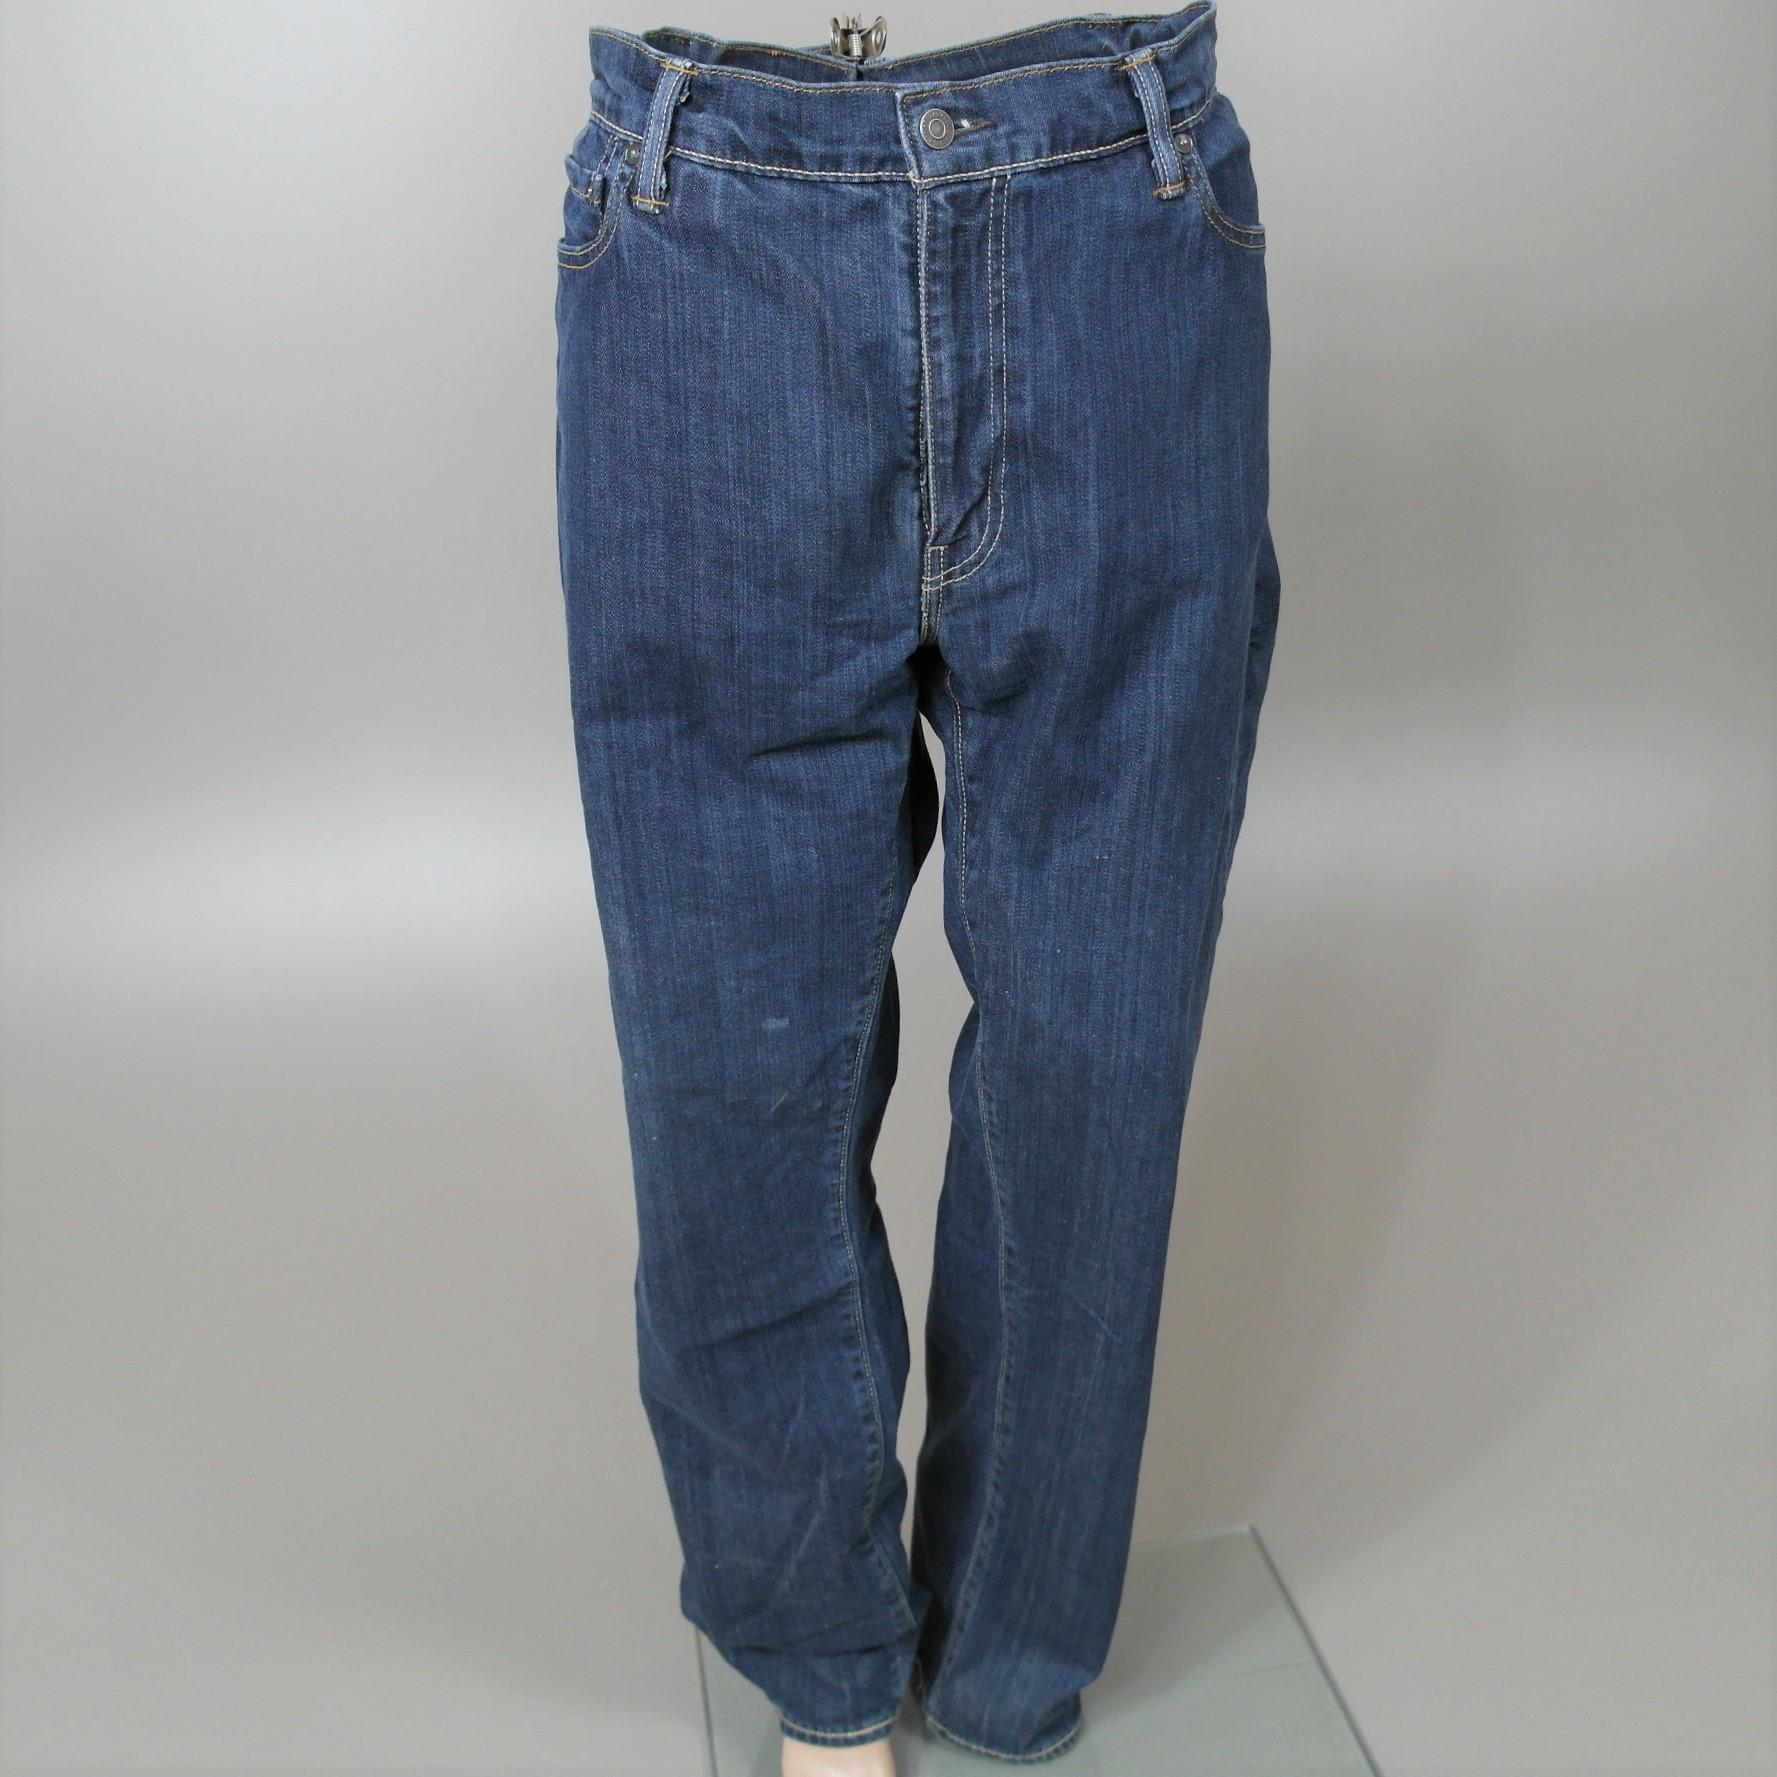 levis jeans storleksguide